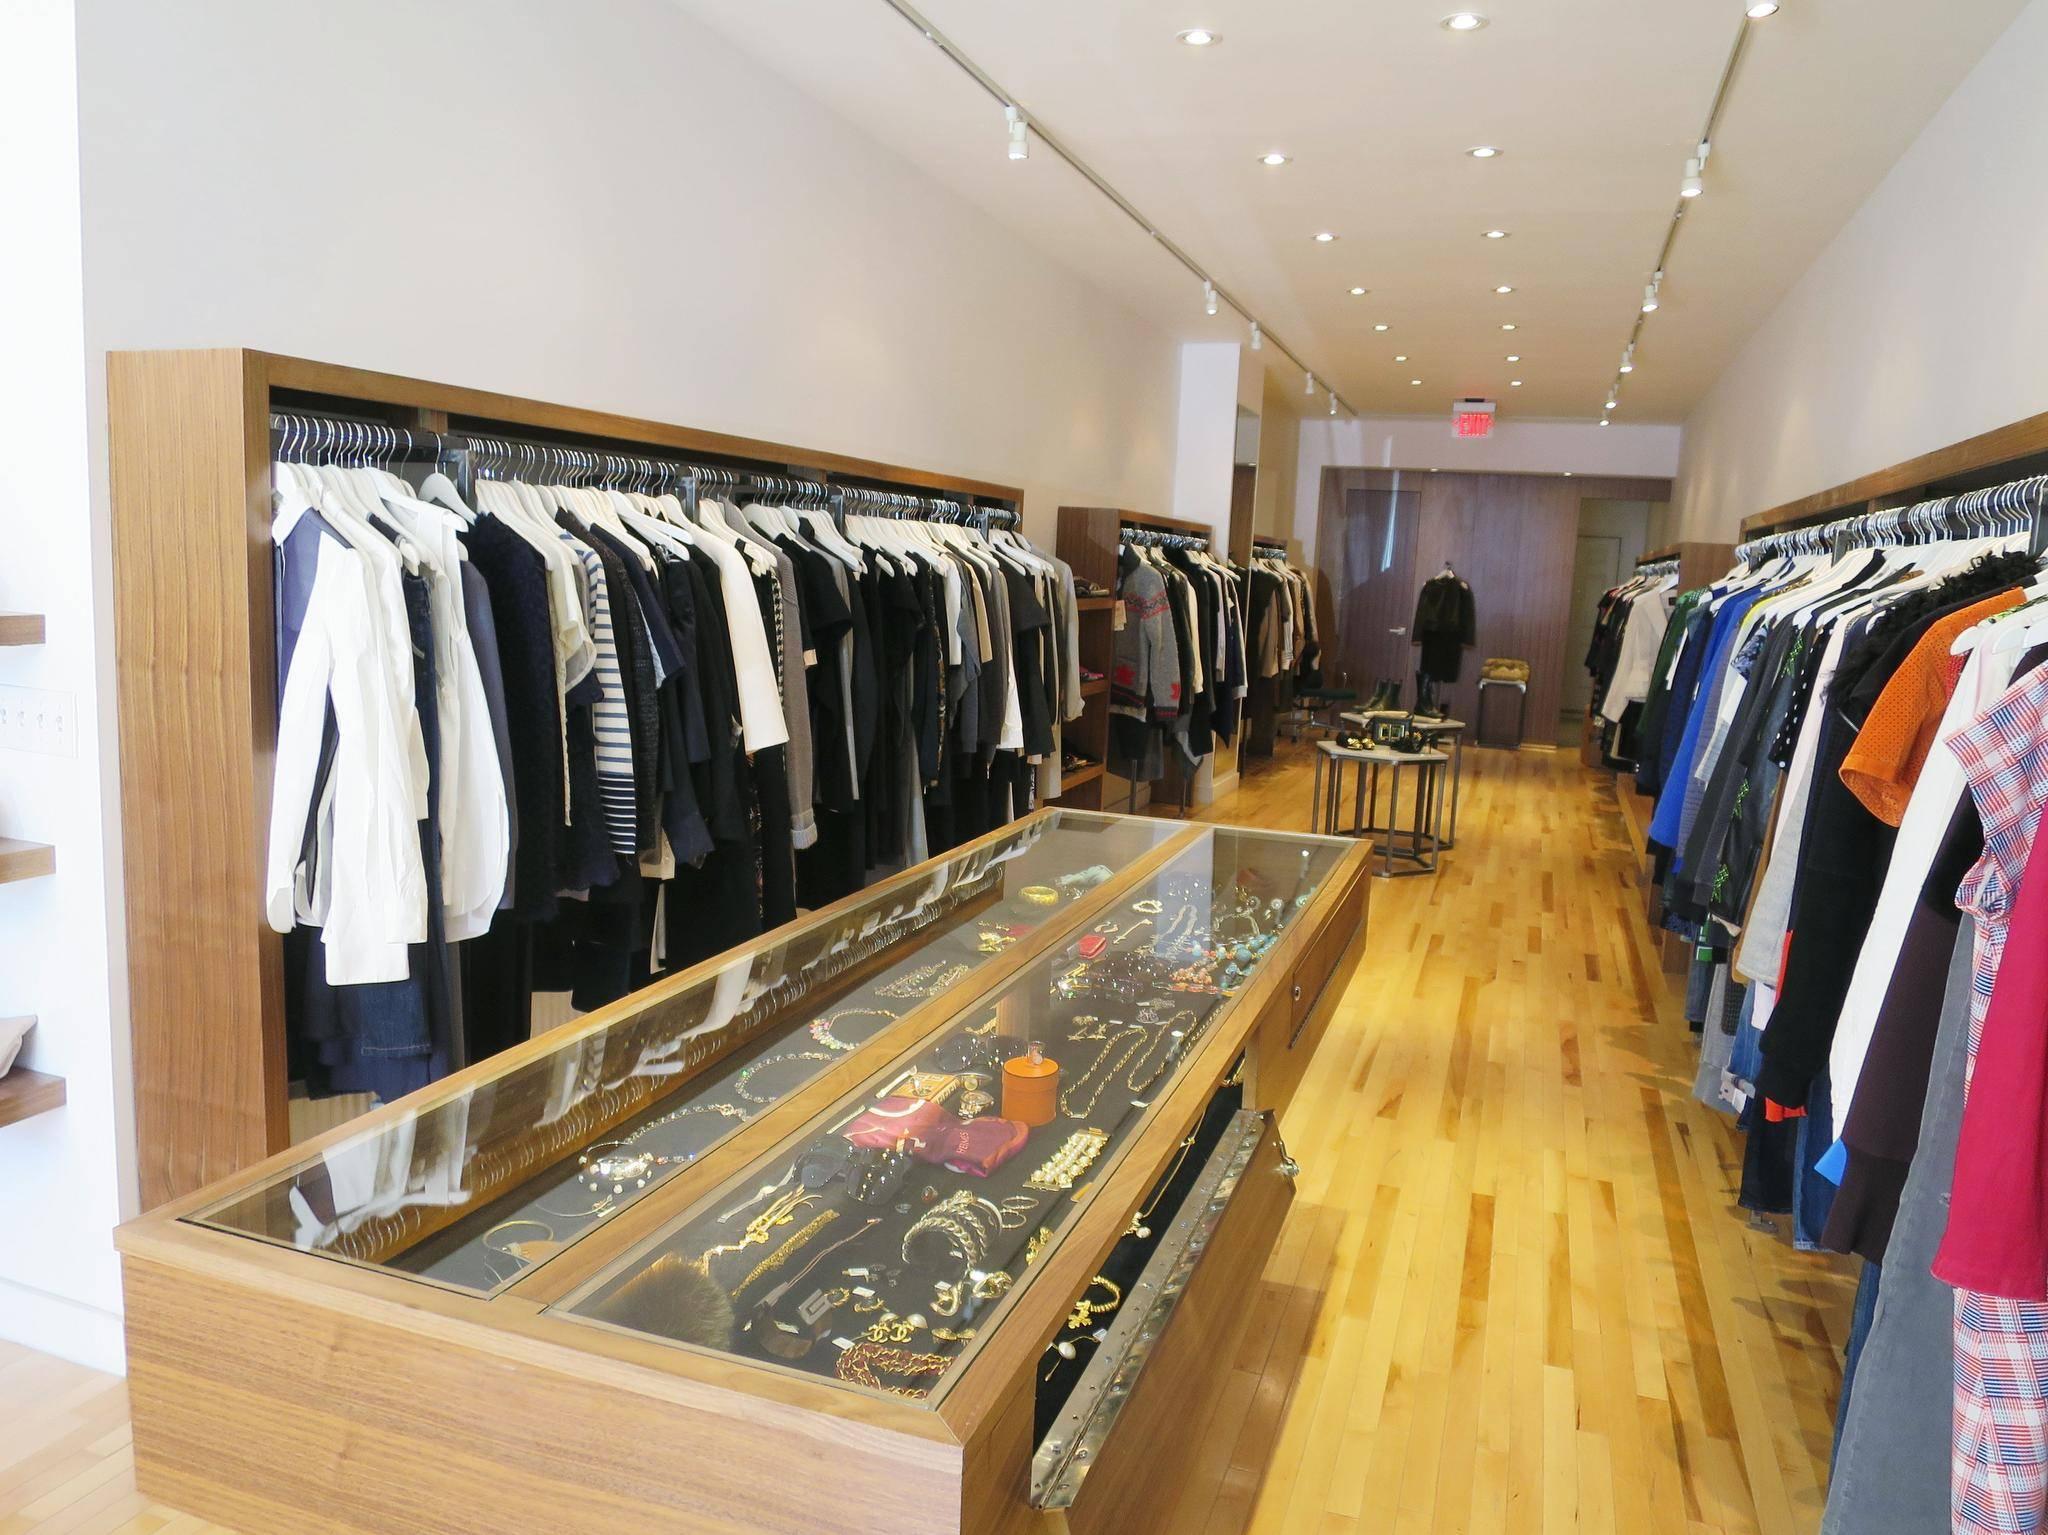 b01b70422cc3 Save big bucks by shopping the wonderful wacky world of designer luxury  consignment